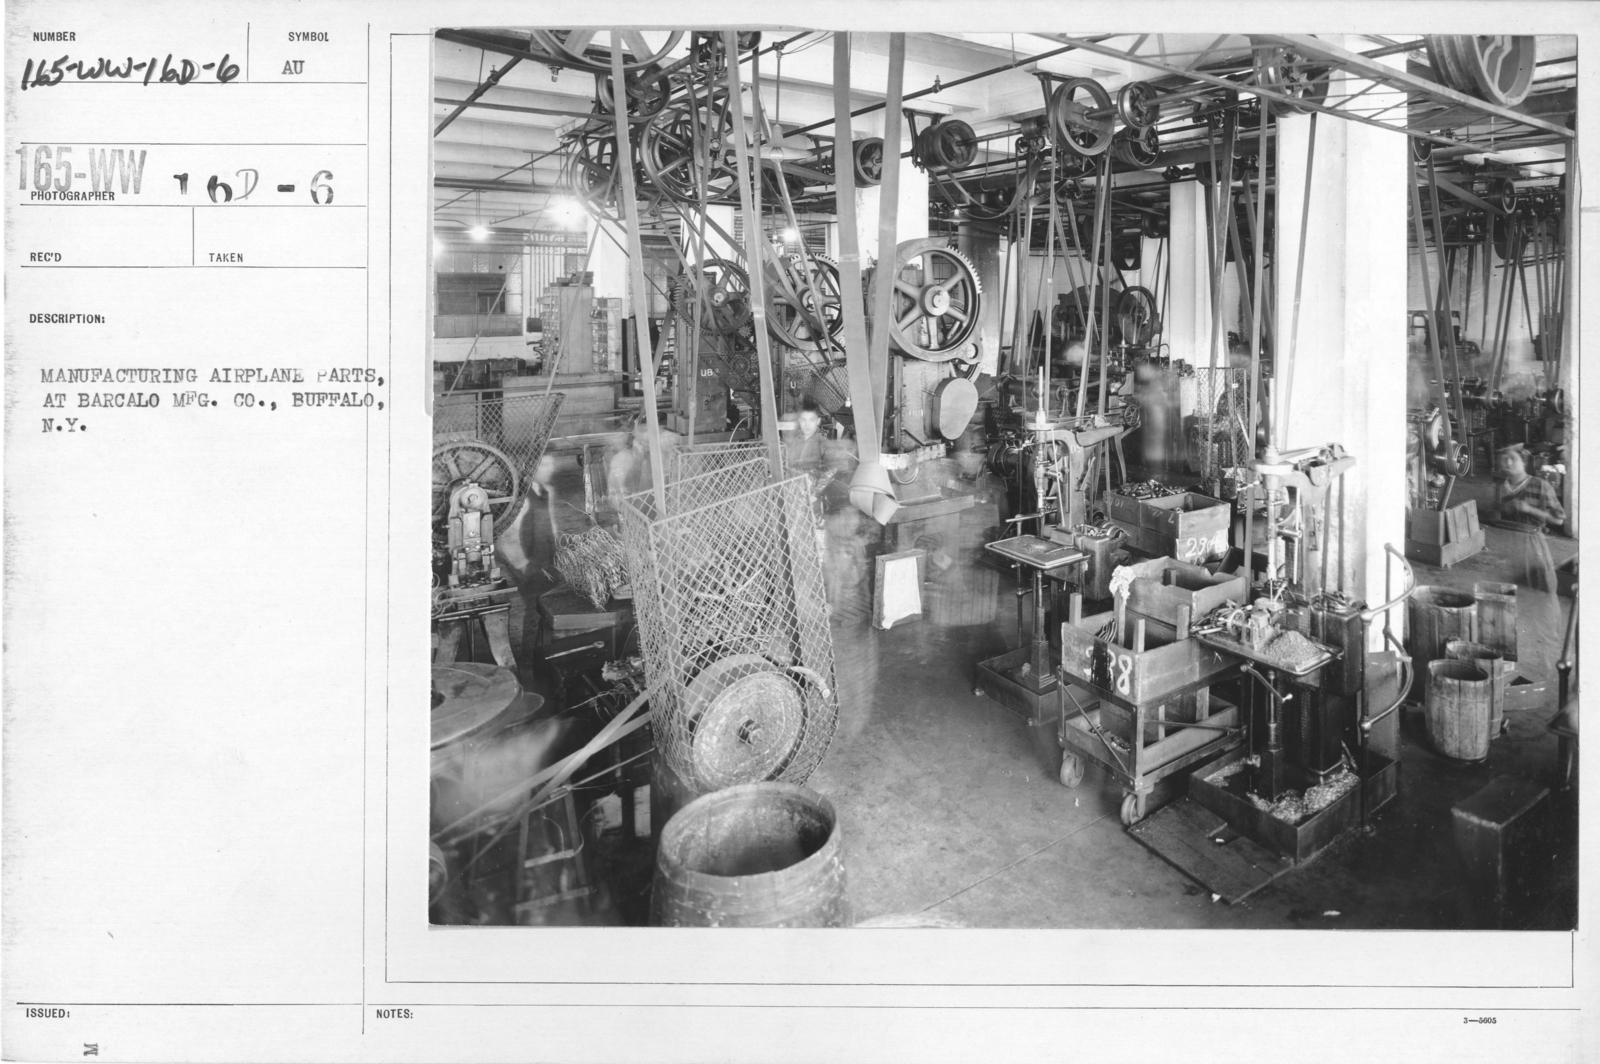 Airplanes - Parts - Manufacturing airplane parts, at Barcalo MFG. Co., Buffalo, N.Y